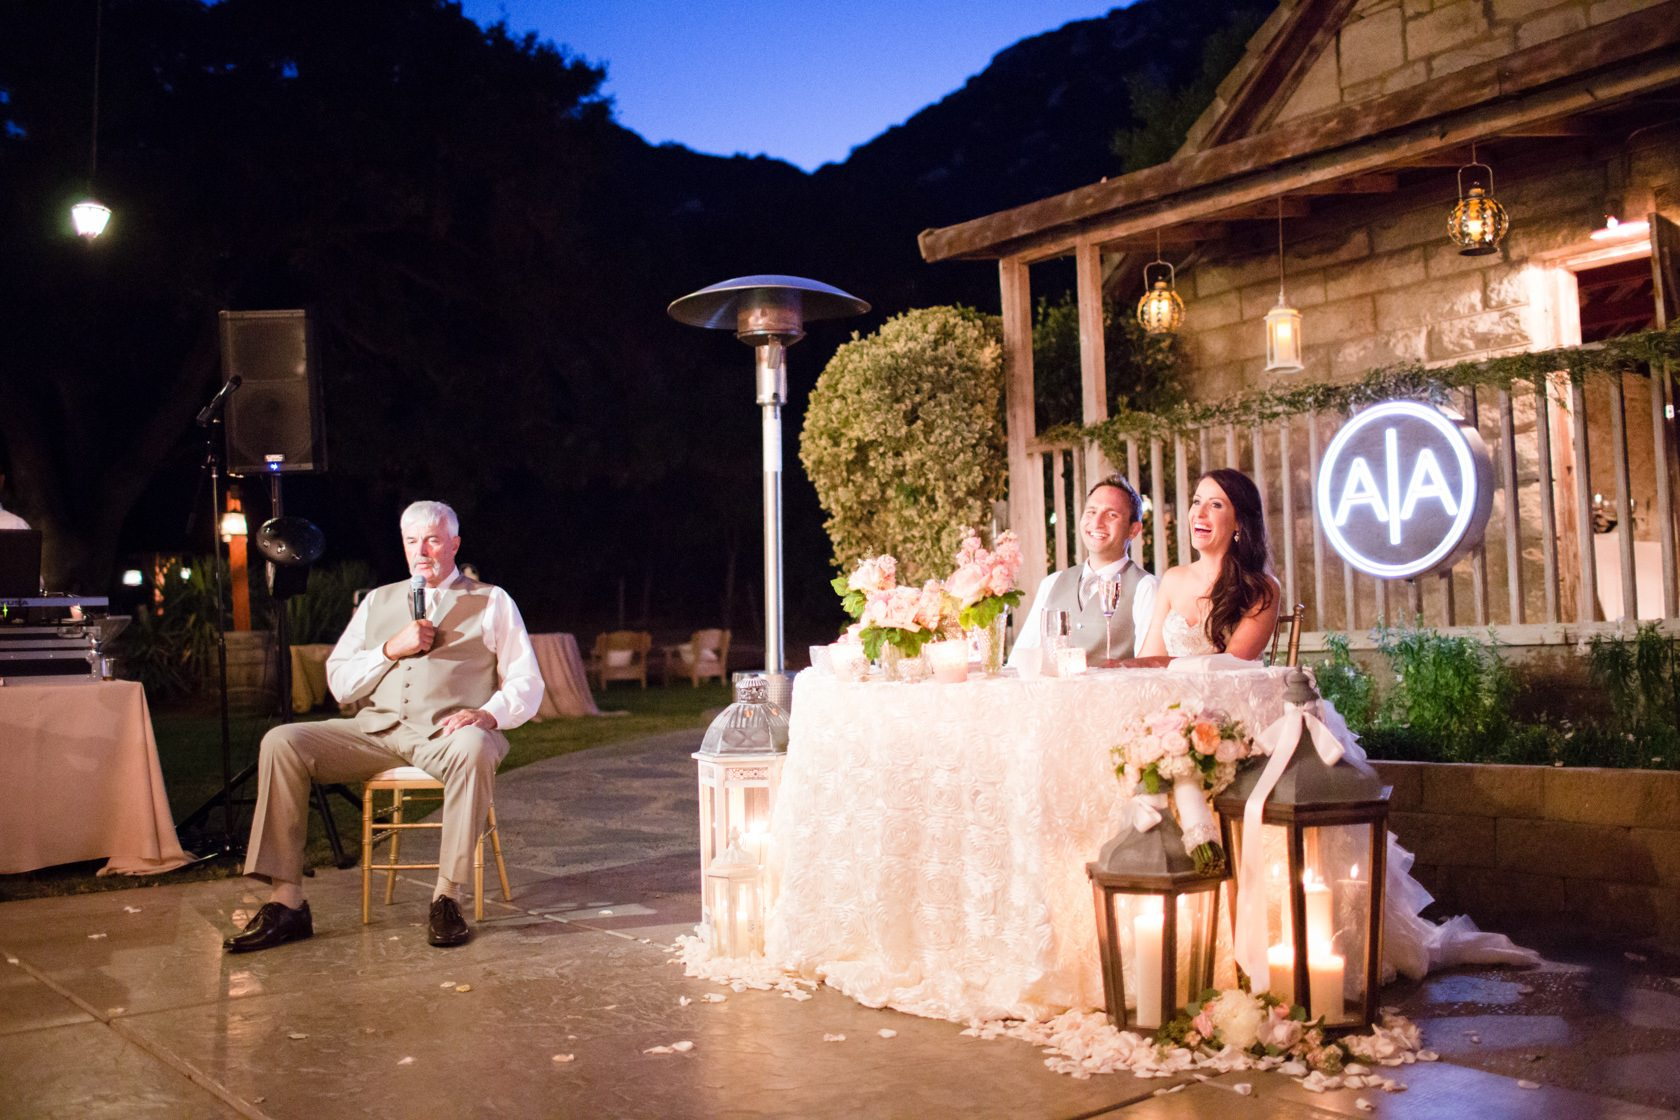 Temecula_Creek_Inn_Wedding_128.jpg